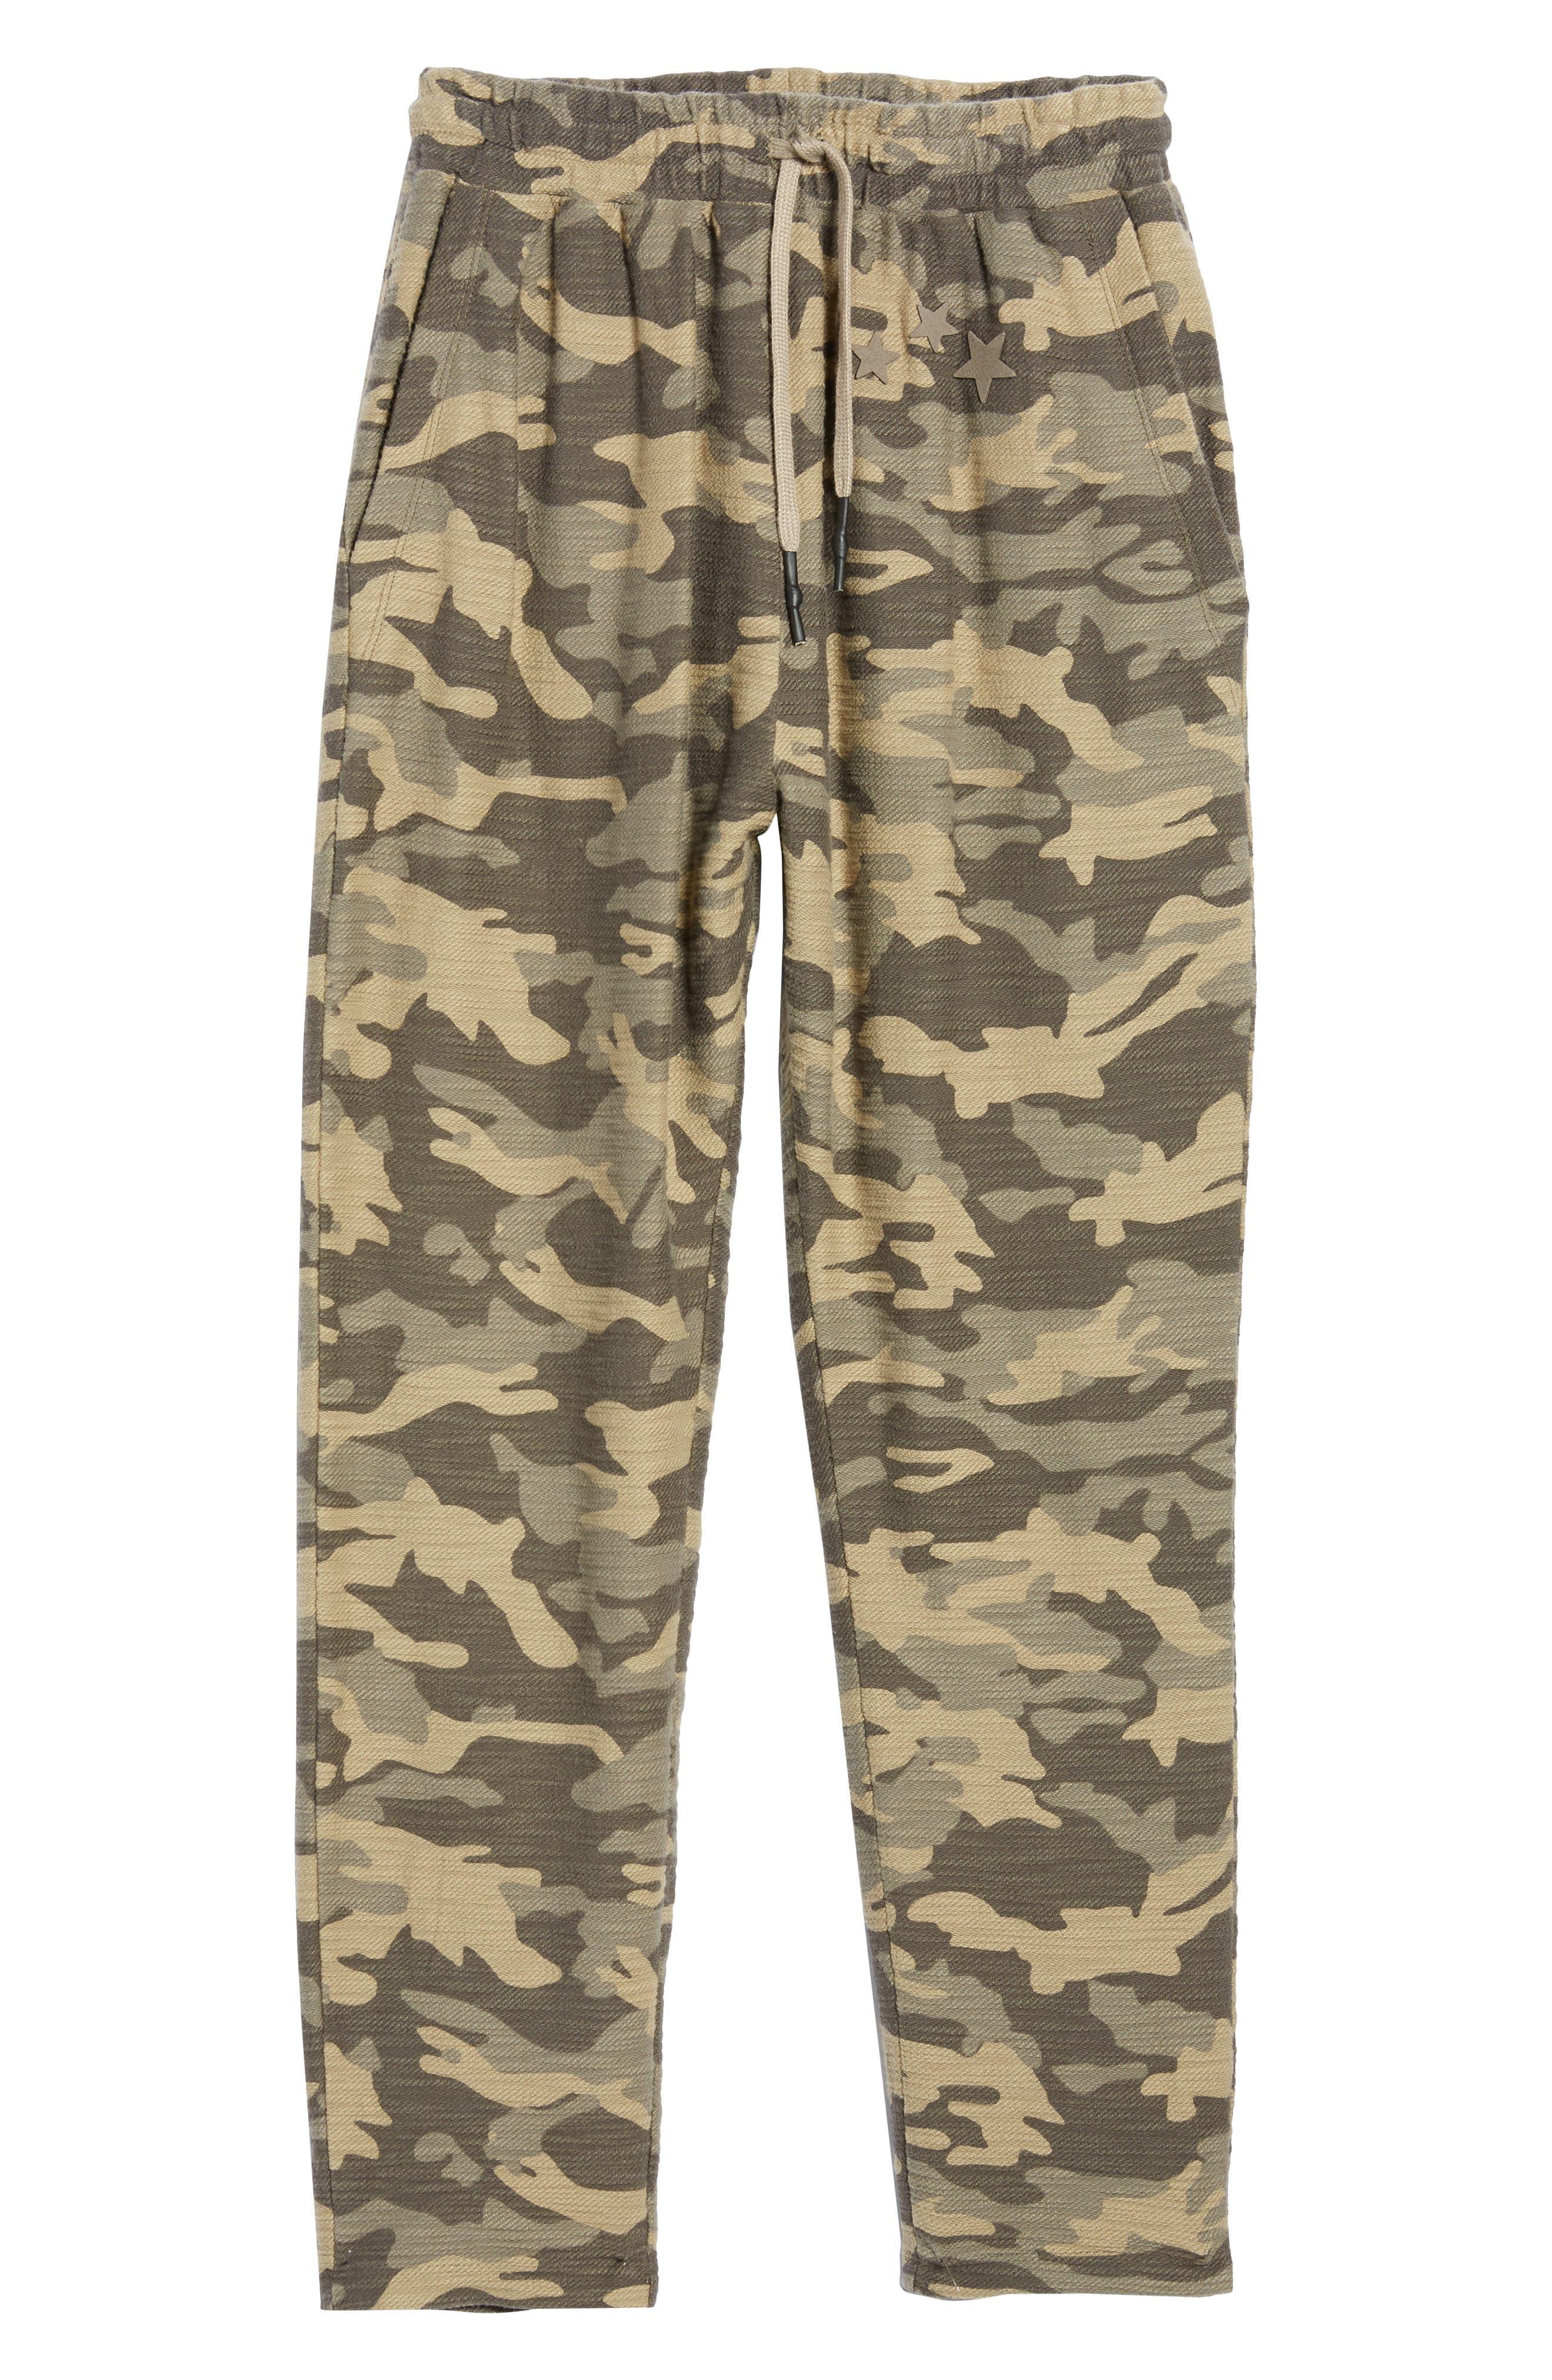 Camo Fleece Sweatpants,                             Alternate thumbnail 6, color,                             300